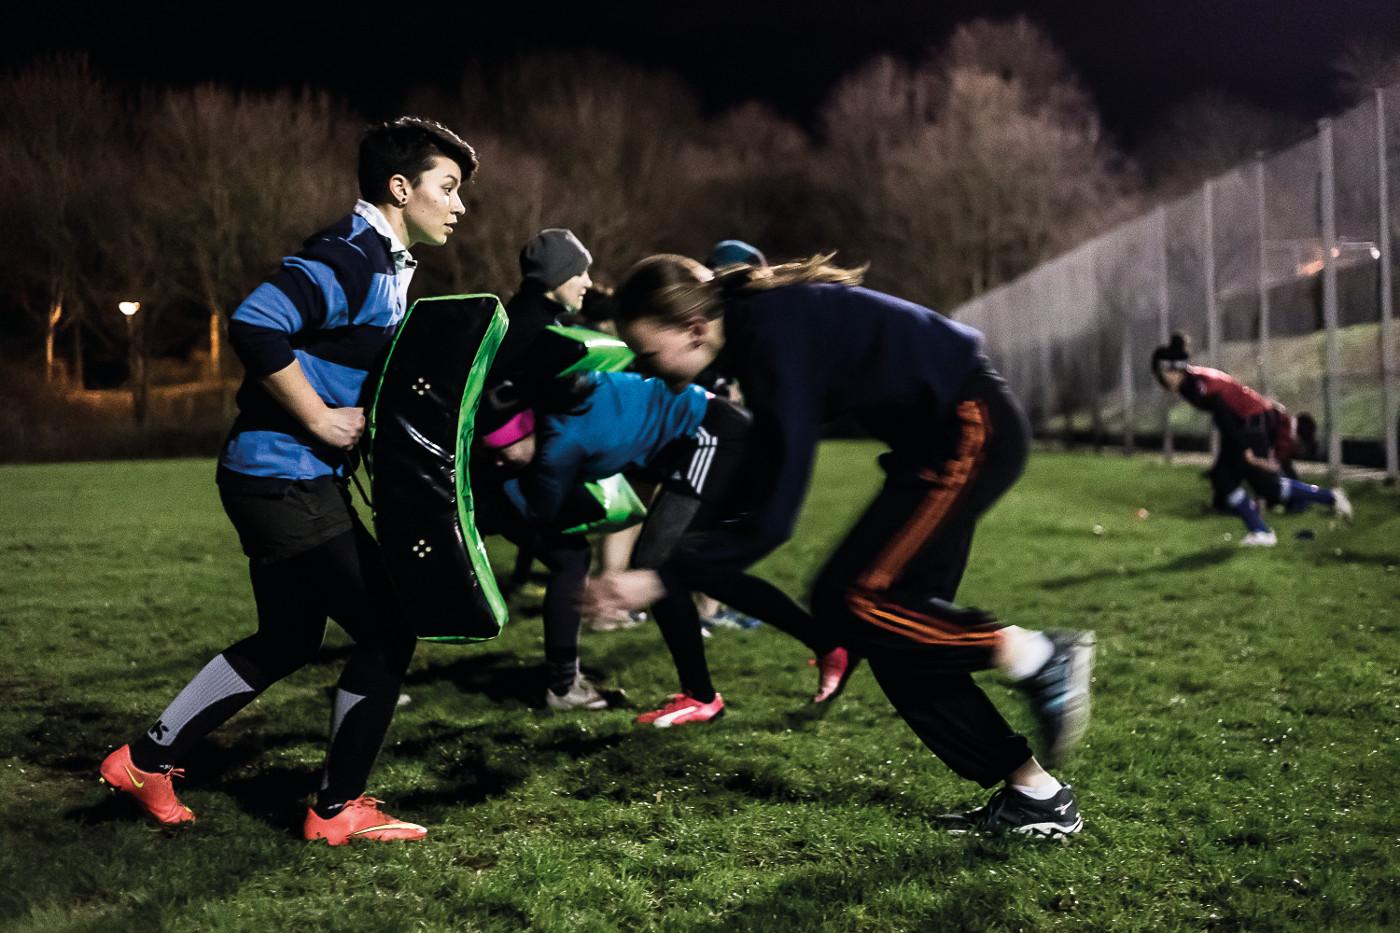 randsport_82_rugby_1